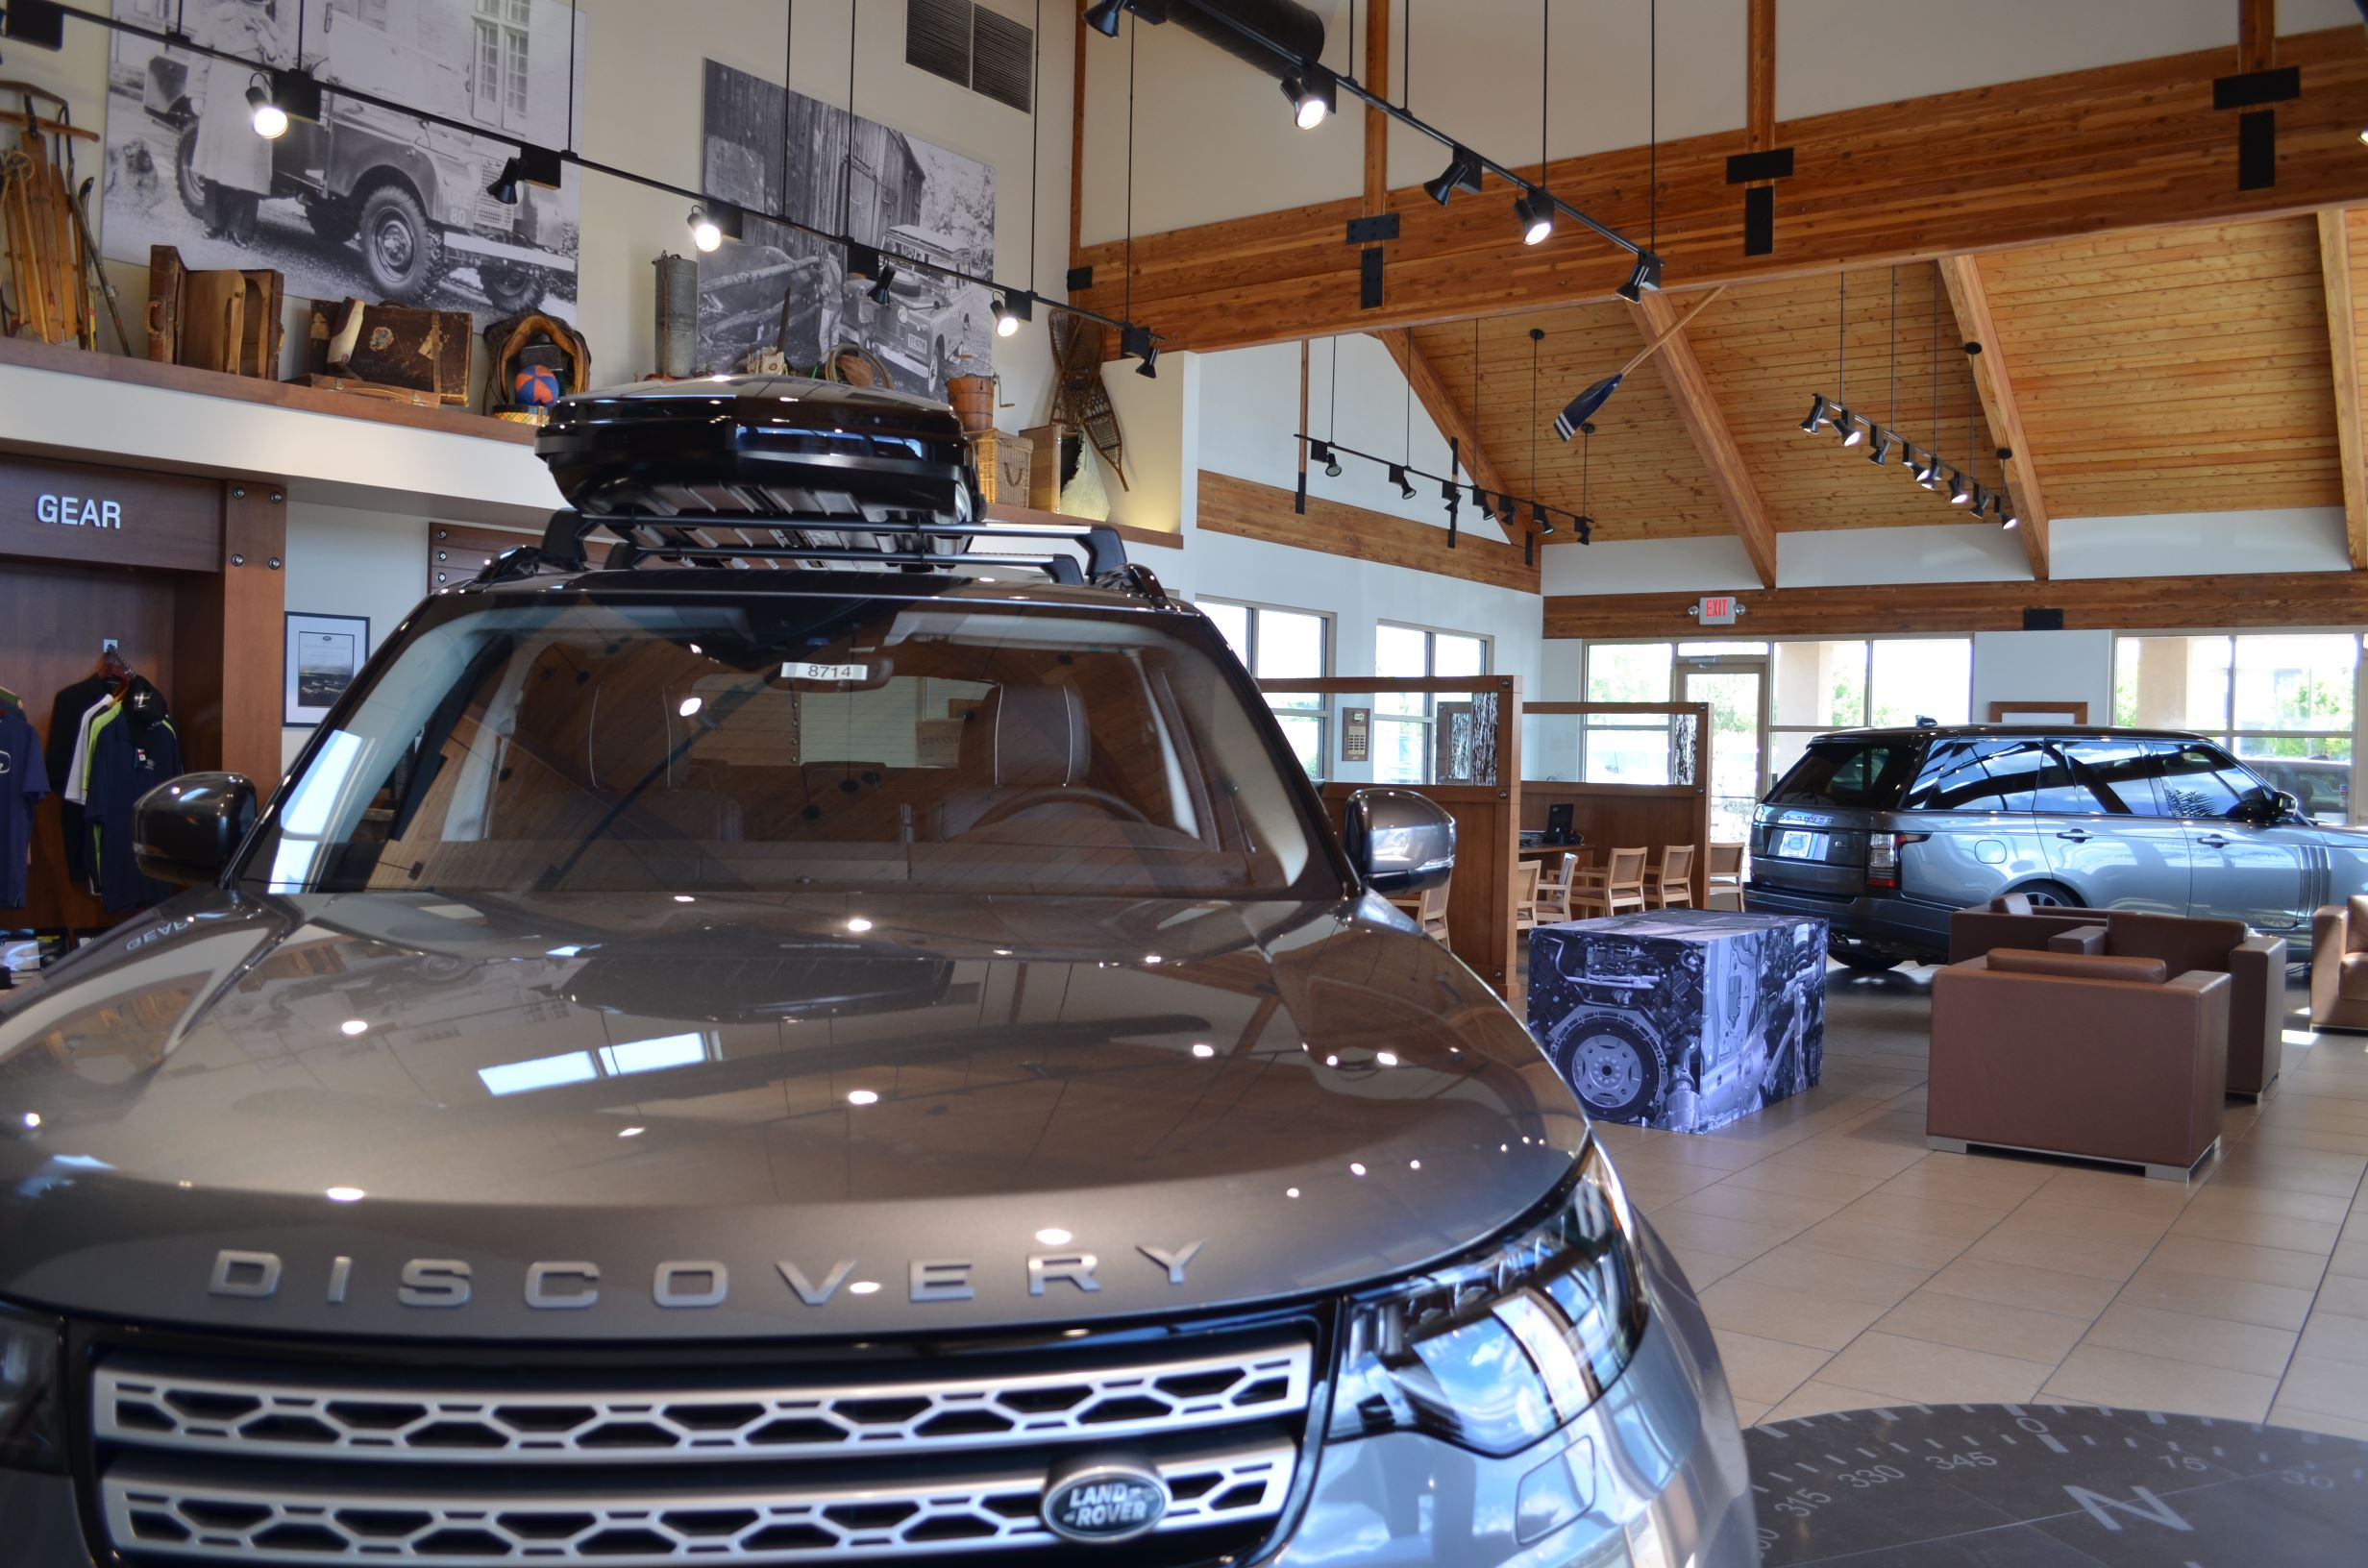 Land Rover Santa Fe image 5